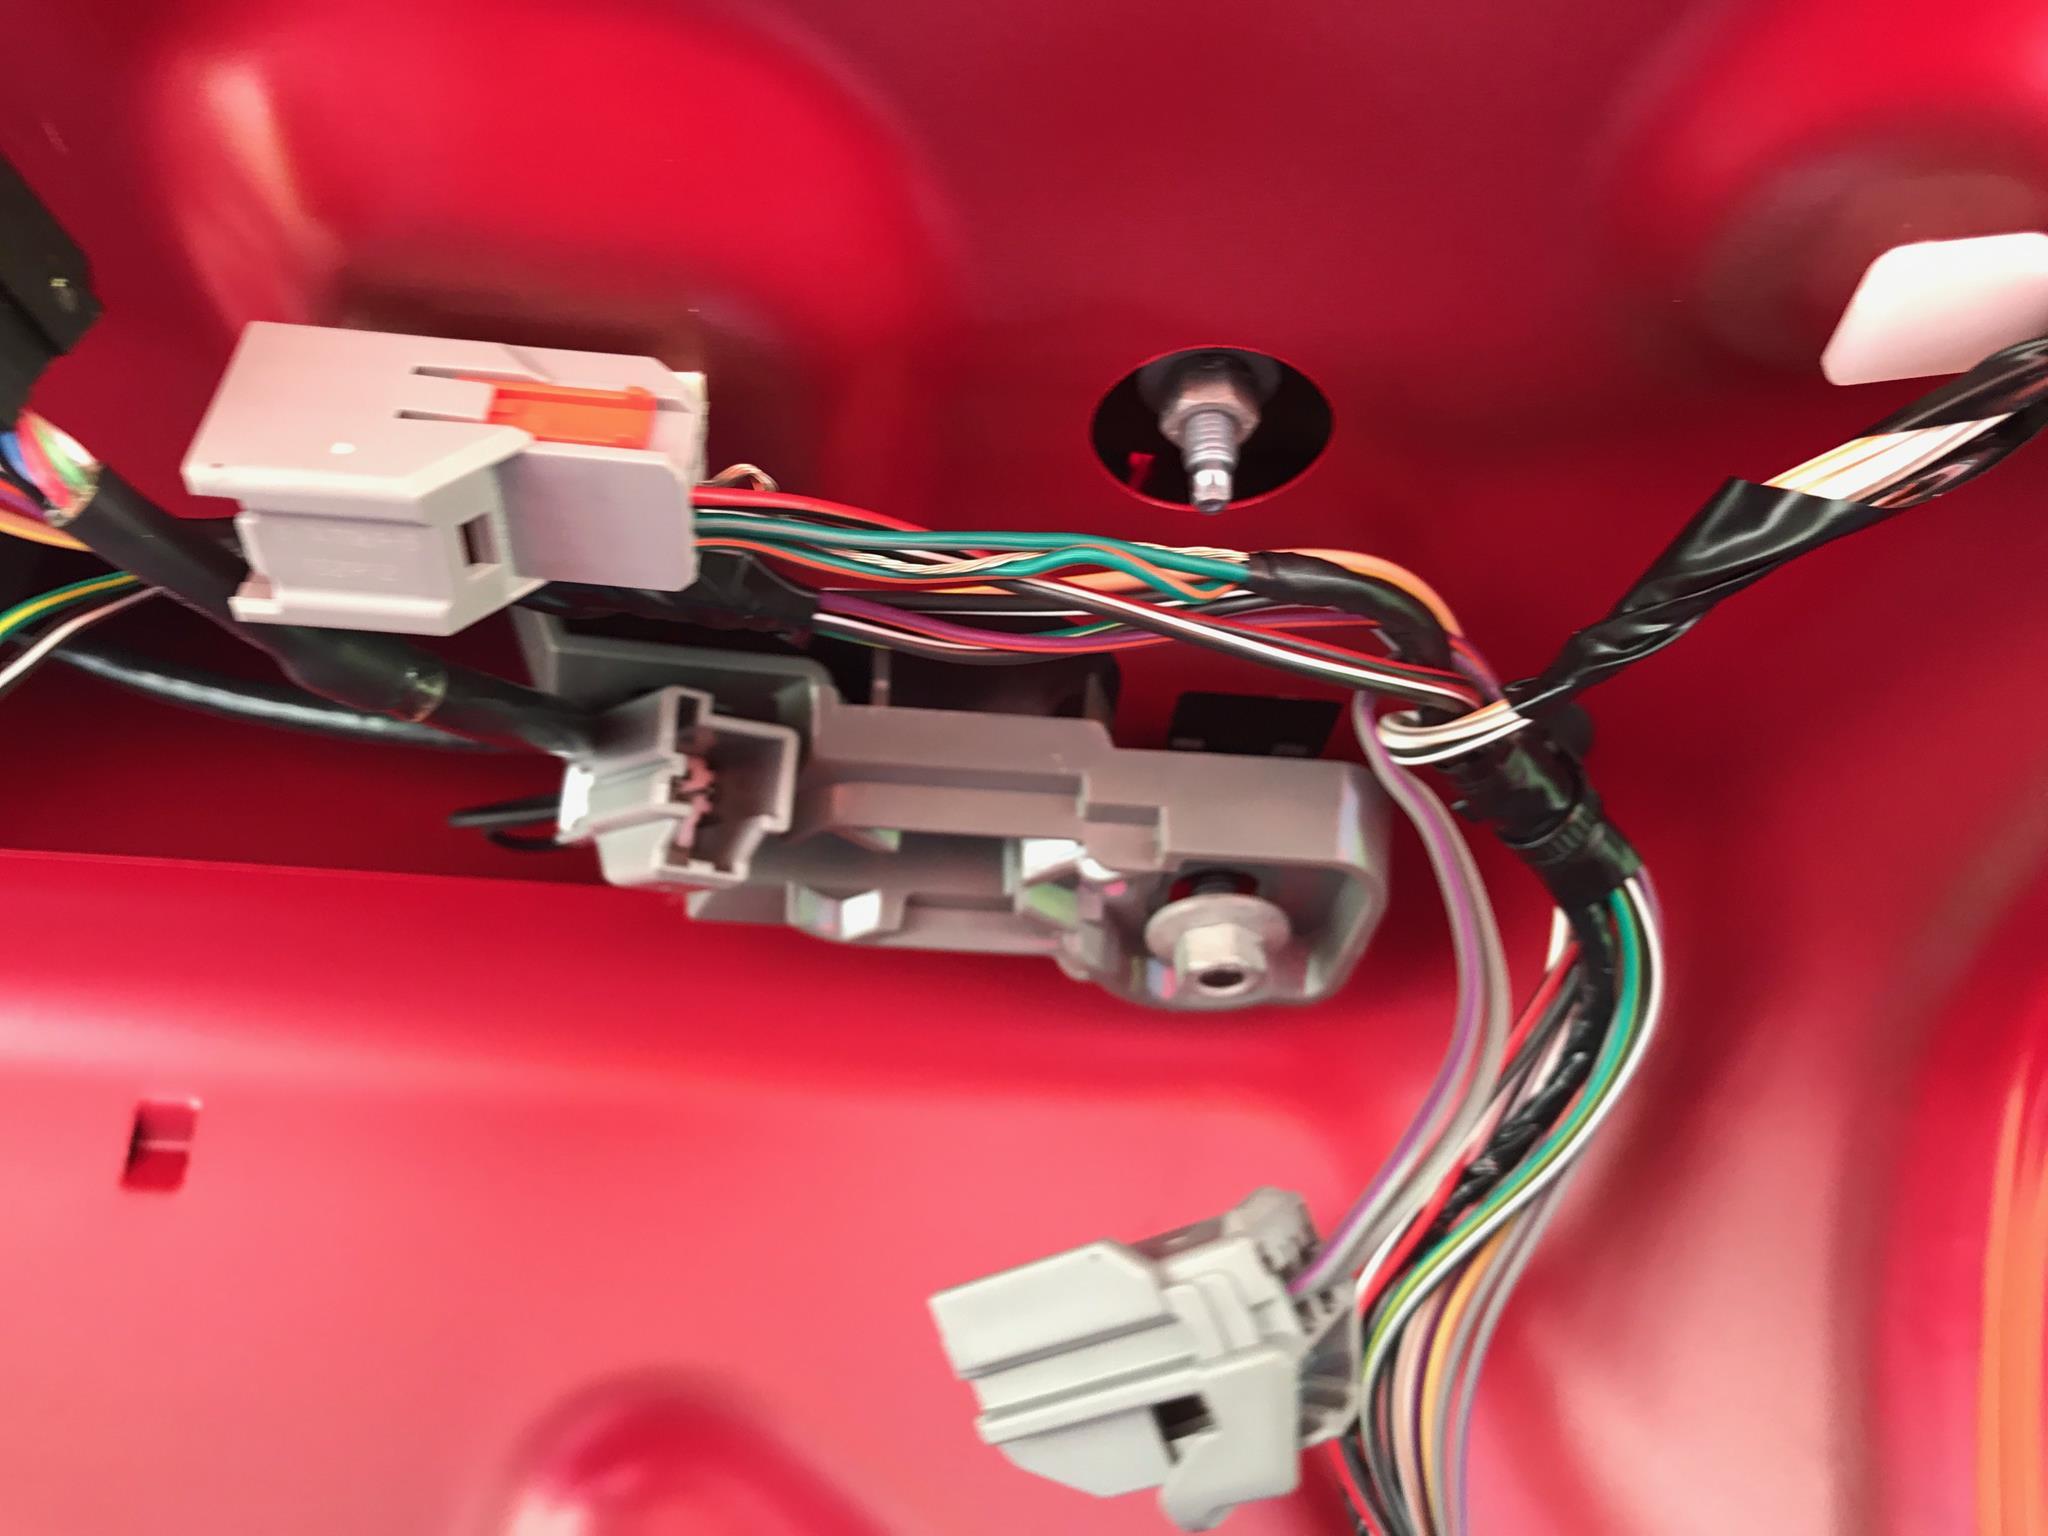 2015 Dodge Challenger Wiring Diagram Camera Windstar Fuel Filter Begeboy Wiring Diagram Source